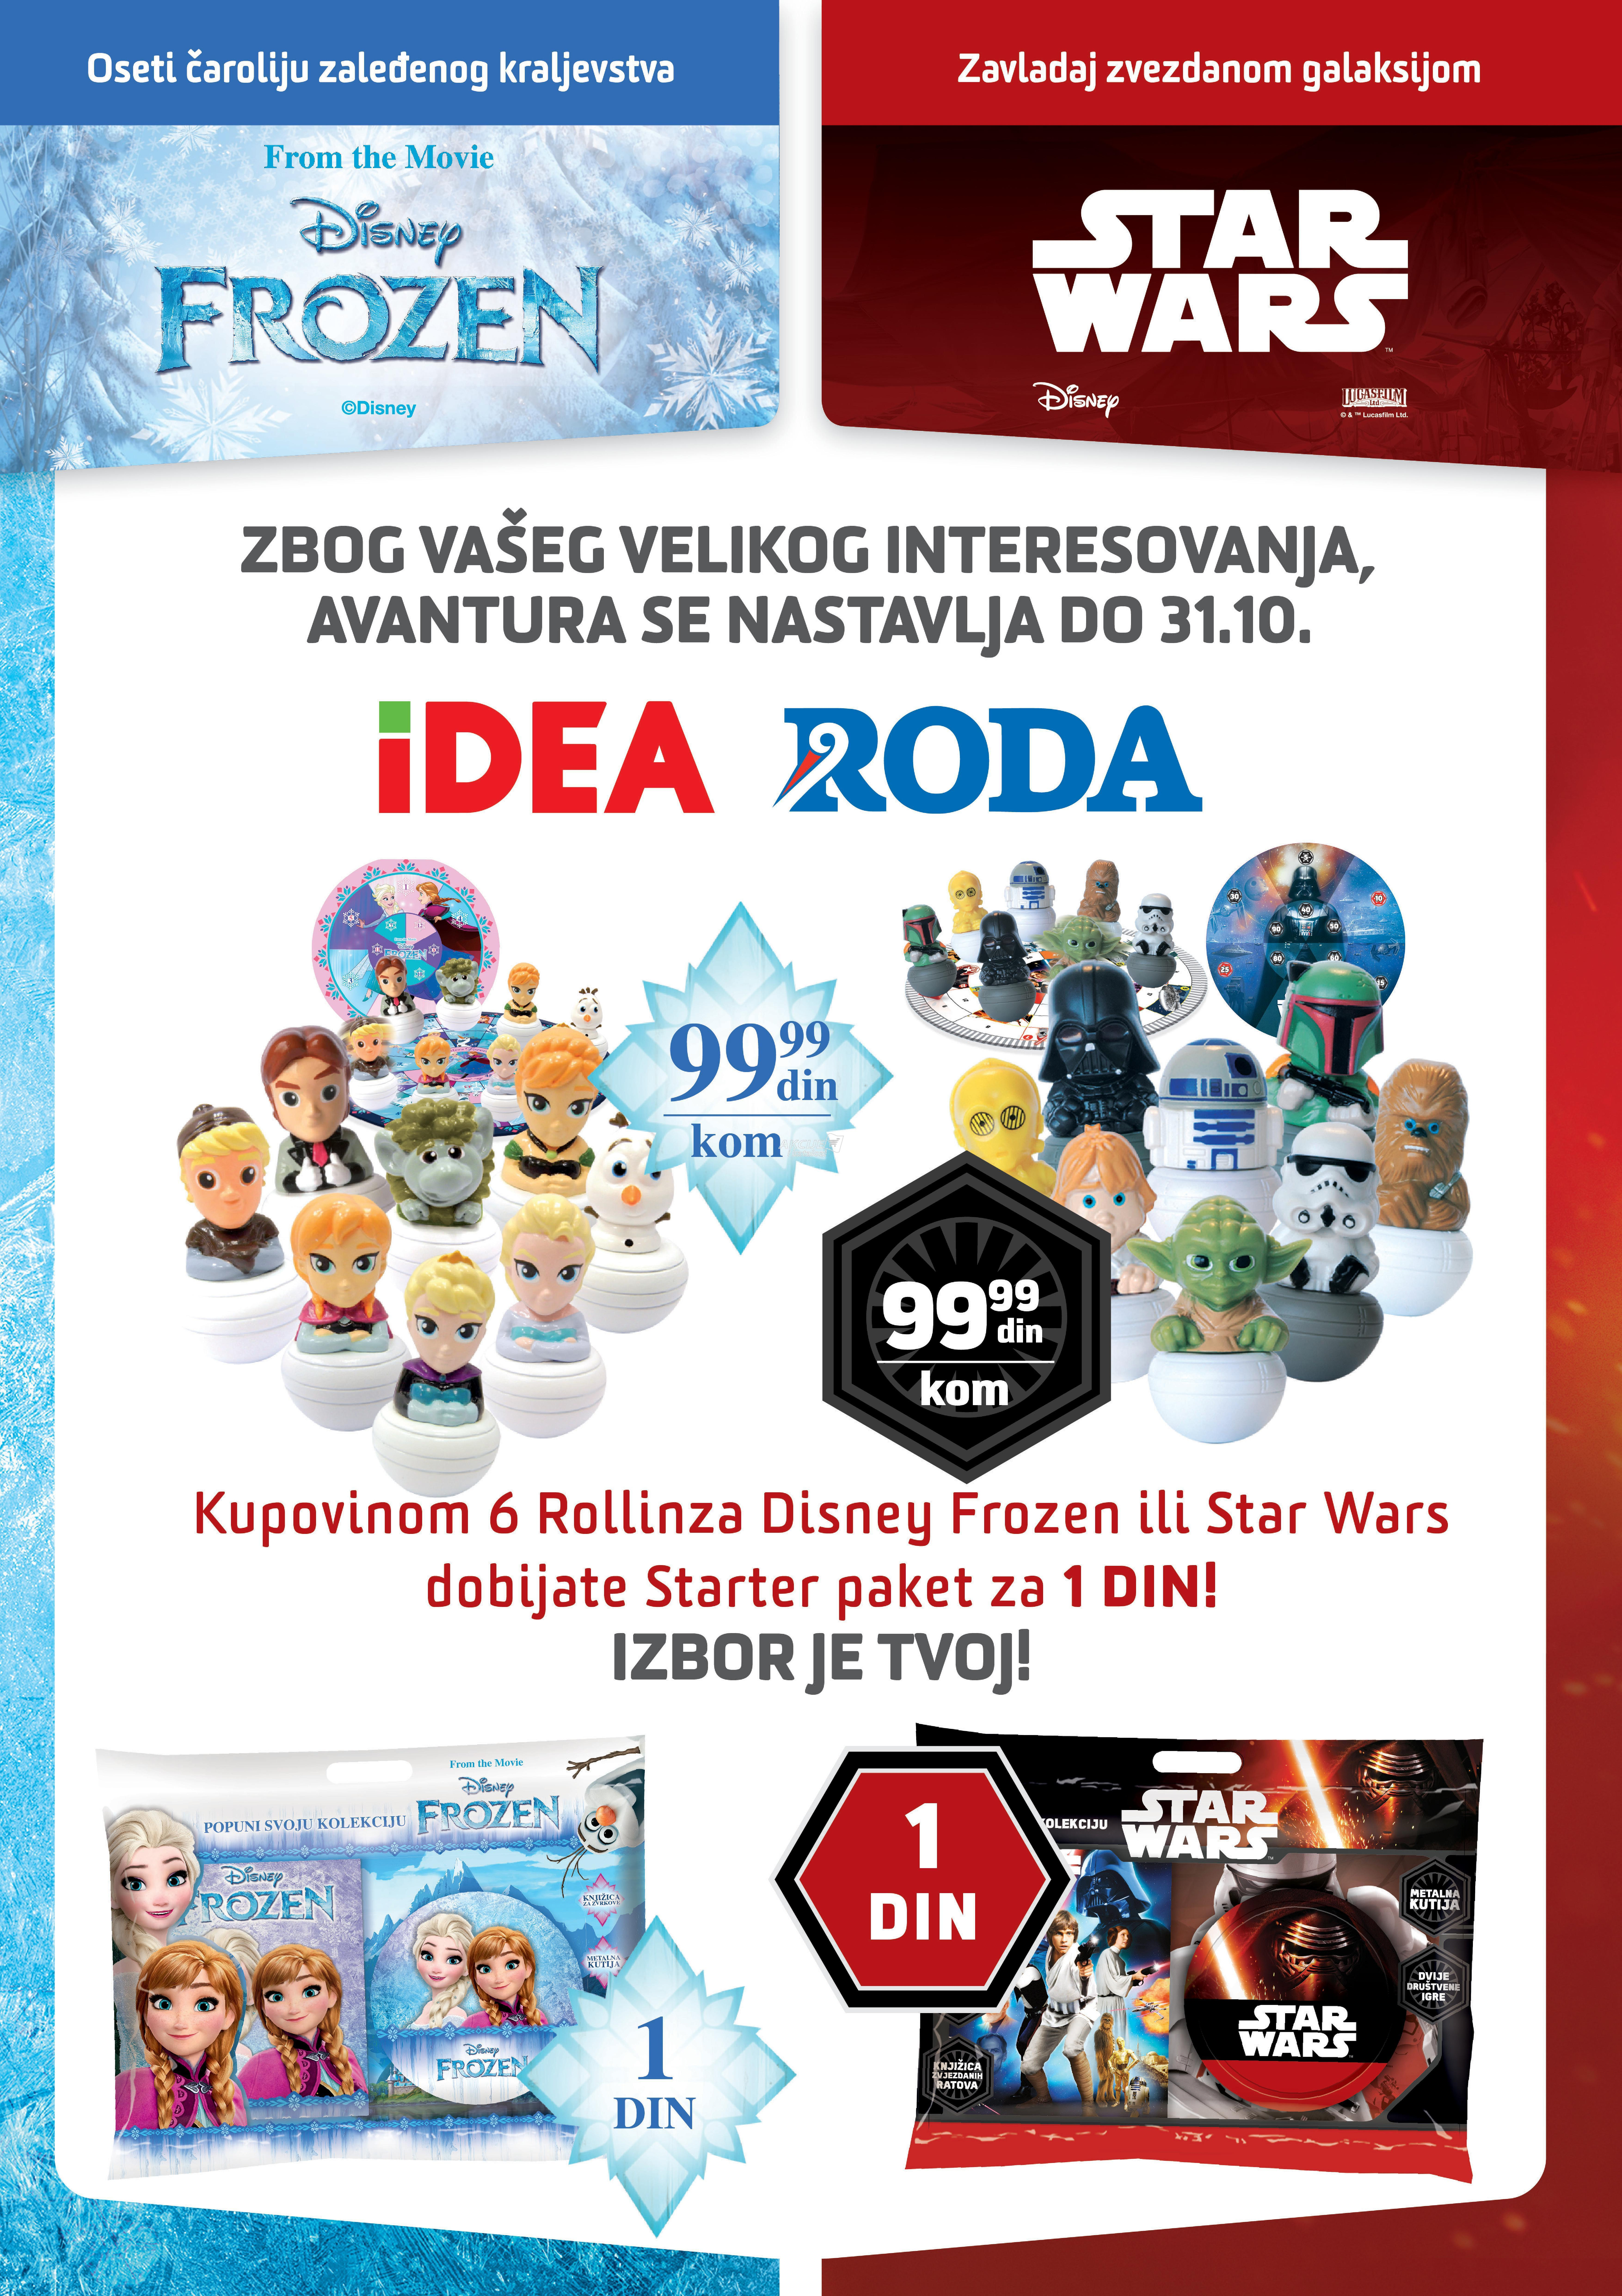 Roda akcija Frozen i Star wars